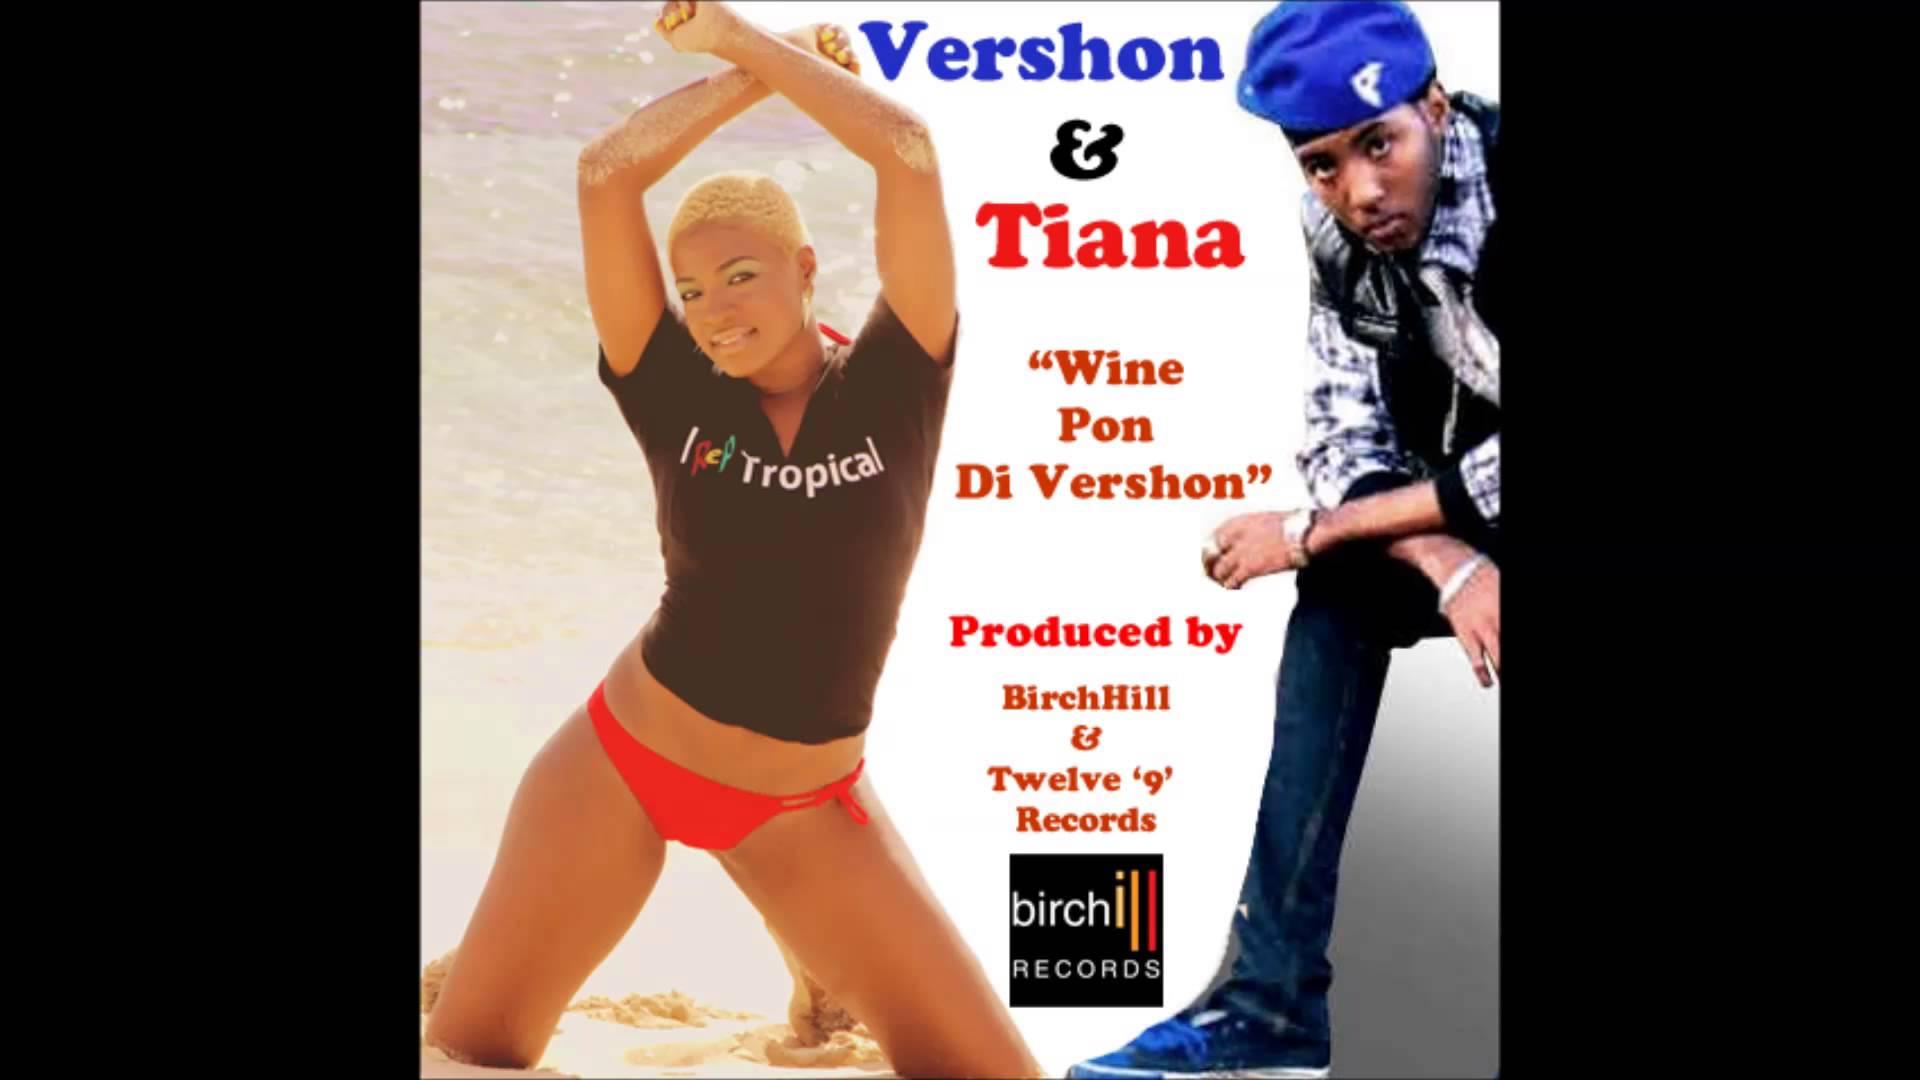 tiana and vershon